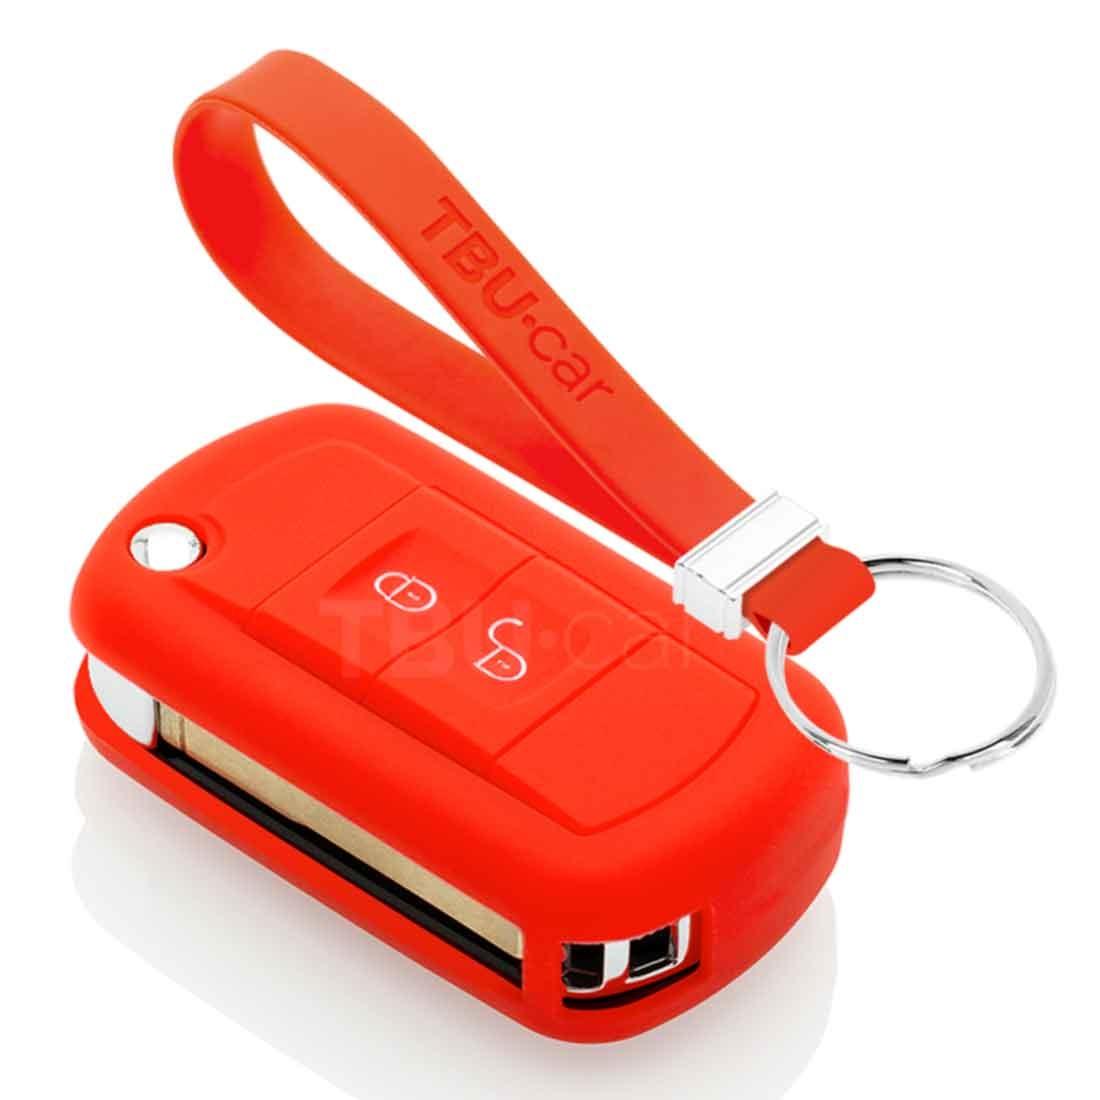 TBU car TBU car Autoschlüssel Hülle kompatibel mit Land Rover 2 Tasten - Schutzhülle aus Silikon - Auto Schlüsselhülle Cover in Rot